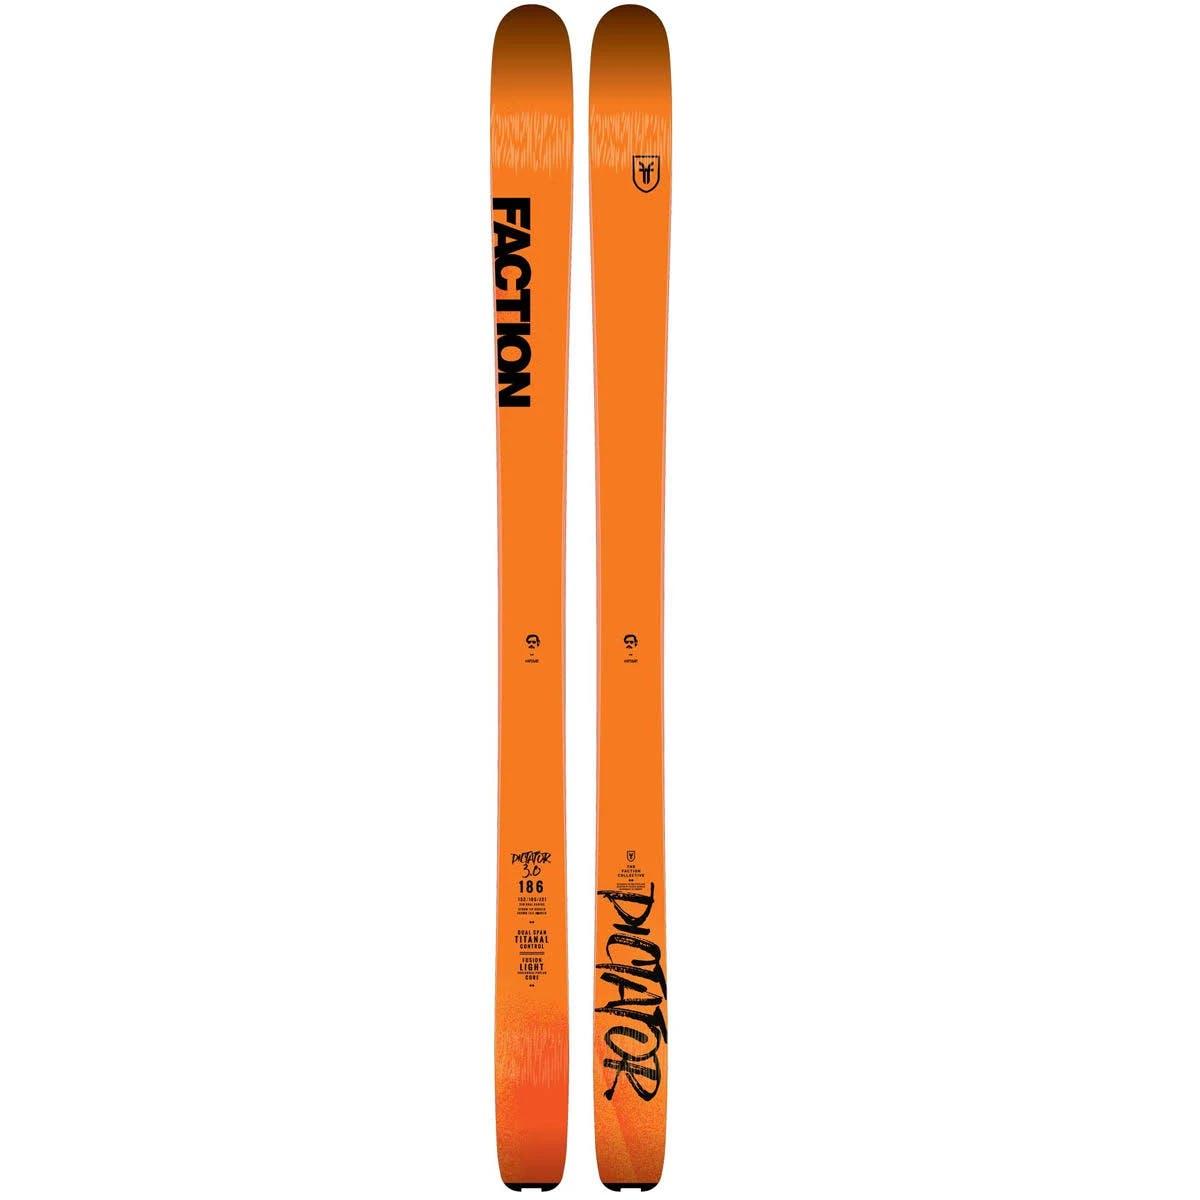 Faction Ski Dictator 3.0 Skis · 2019